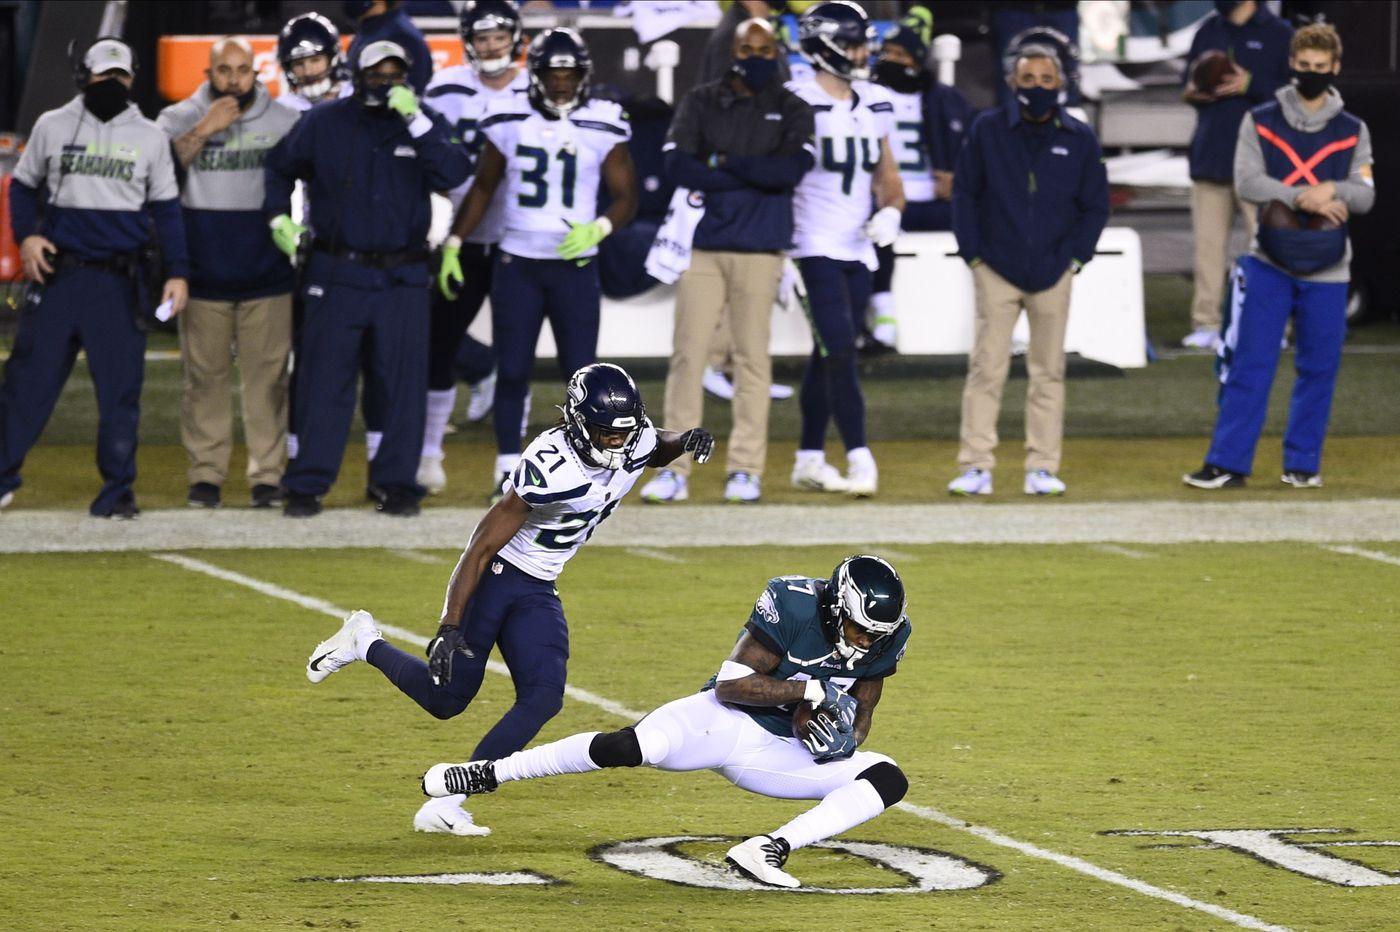 Why didn't the Eagles use Travis Fulgham more, Alshon Jeffery less vs. Seahawks?